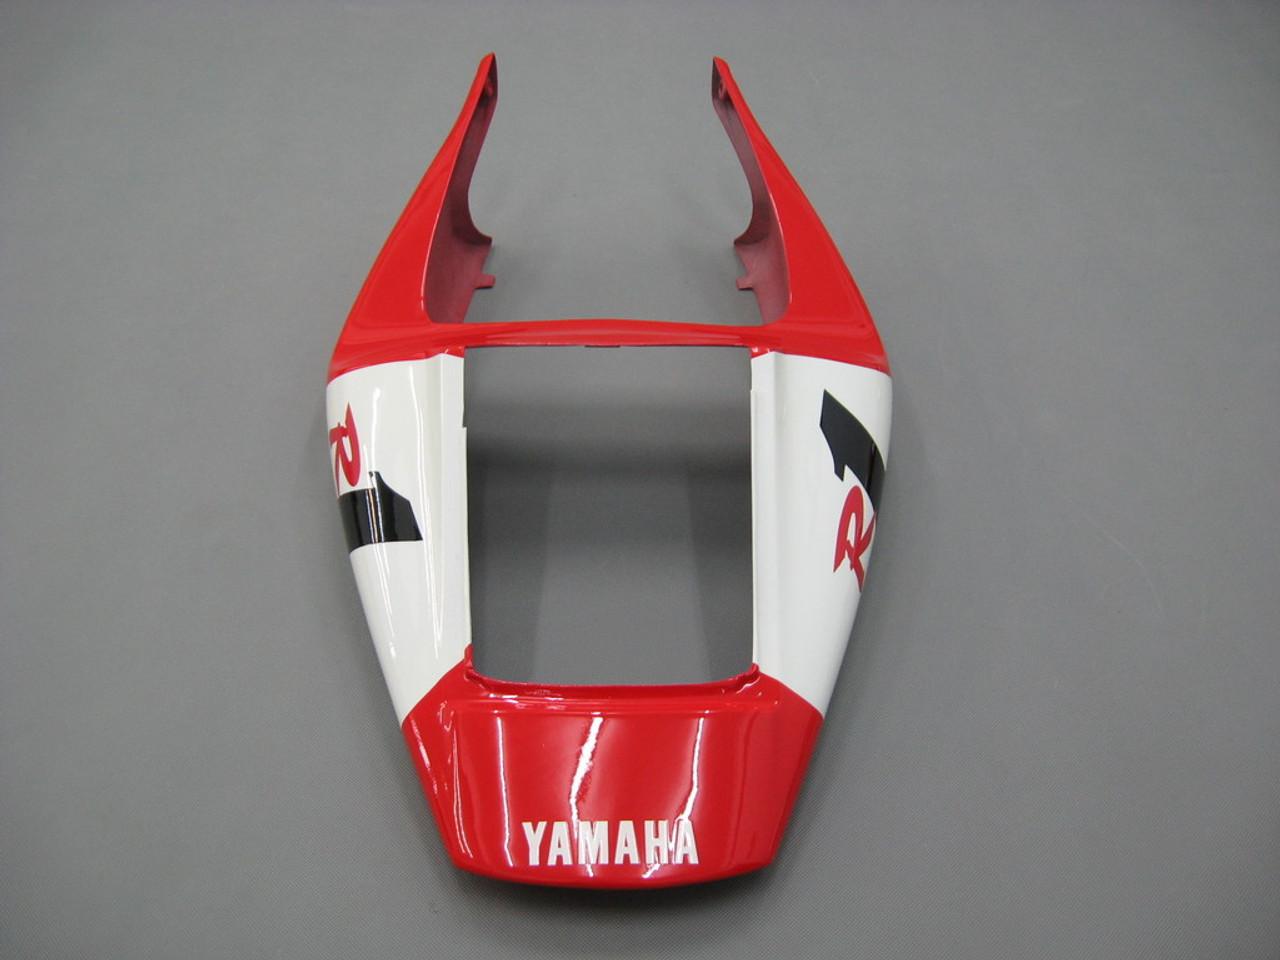 Fairings Yamaha YZF-R1 Red White Virgin  R1 Racing (1998-1999)